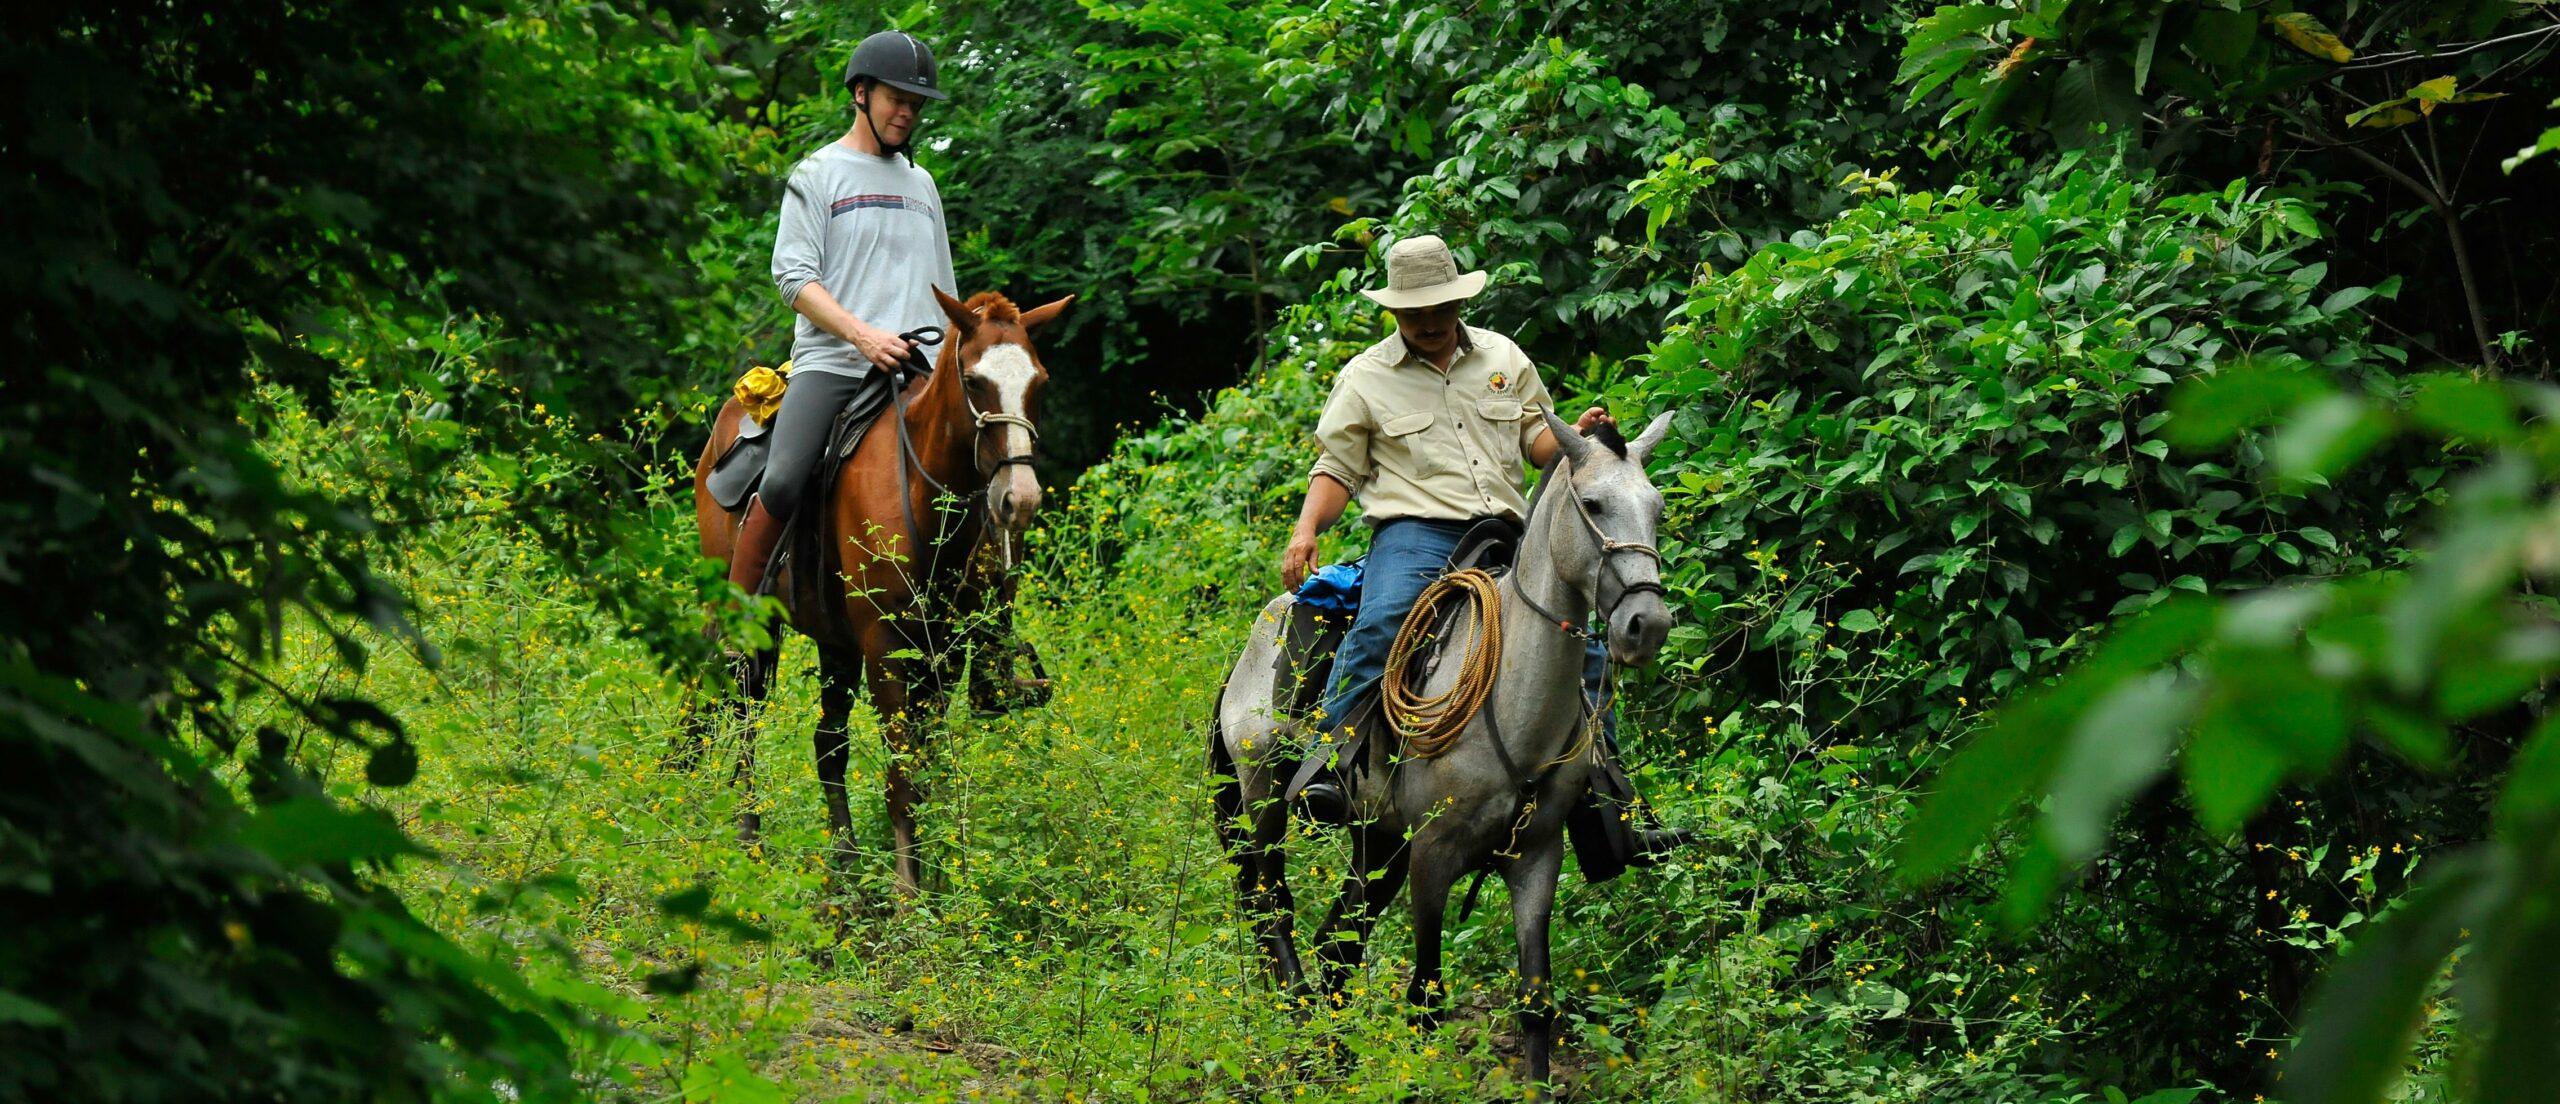 Regenwoud te paard in Costa Rica - Vakantie te paard / Reisbureau Perlan